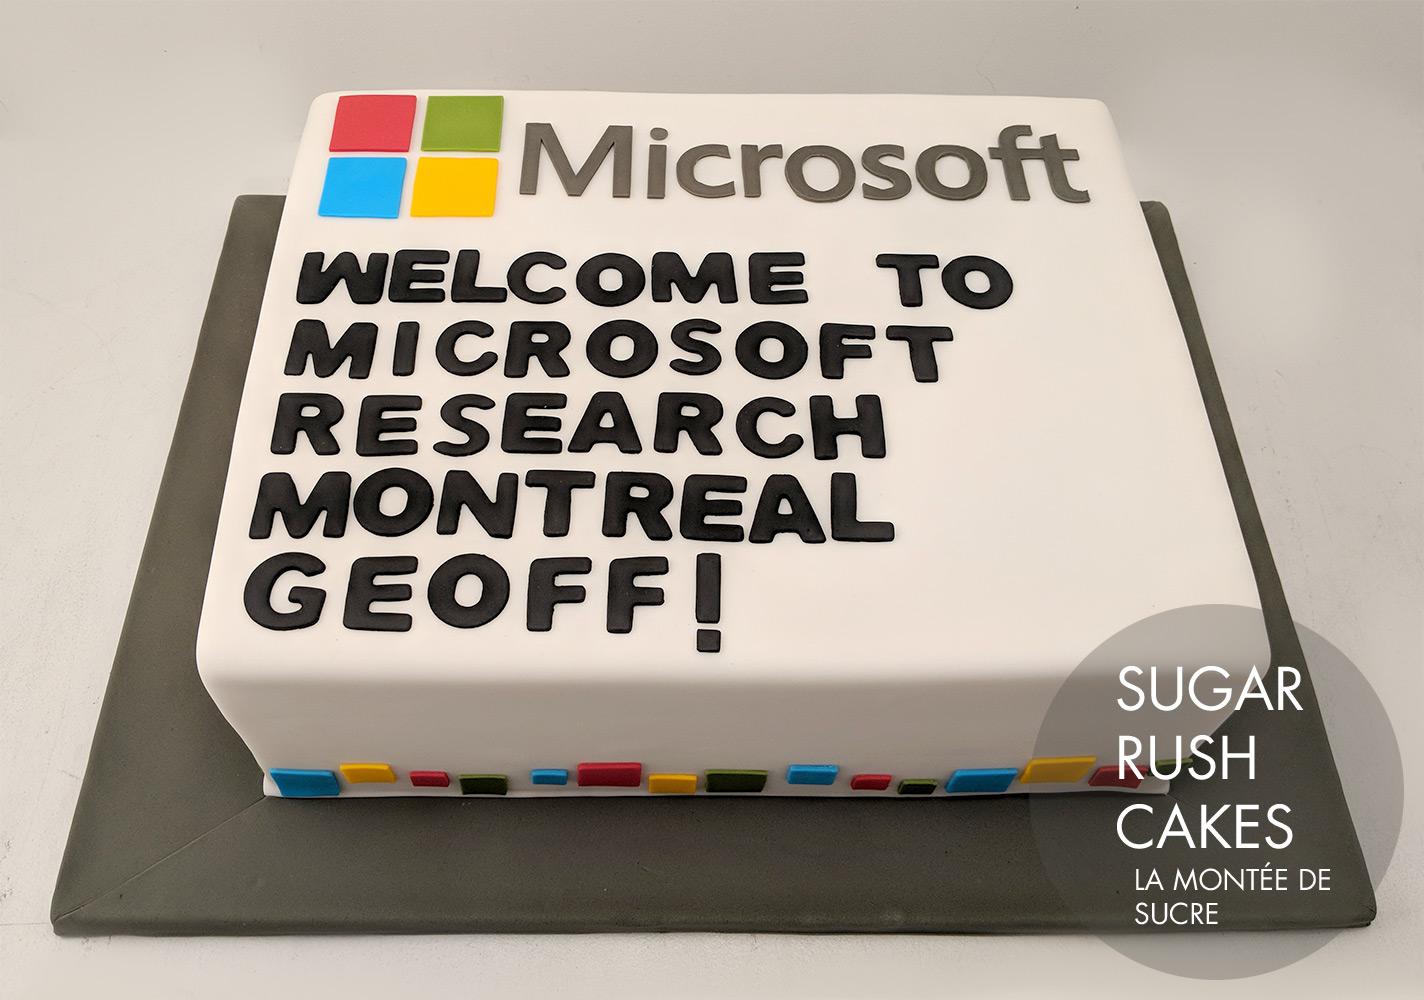 Microsoft Cake